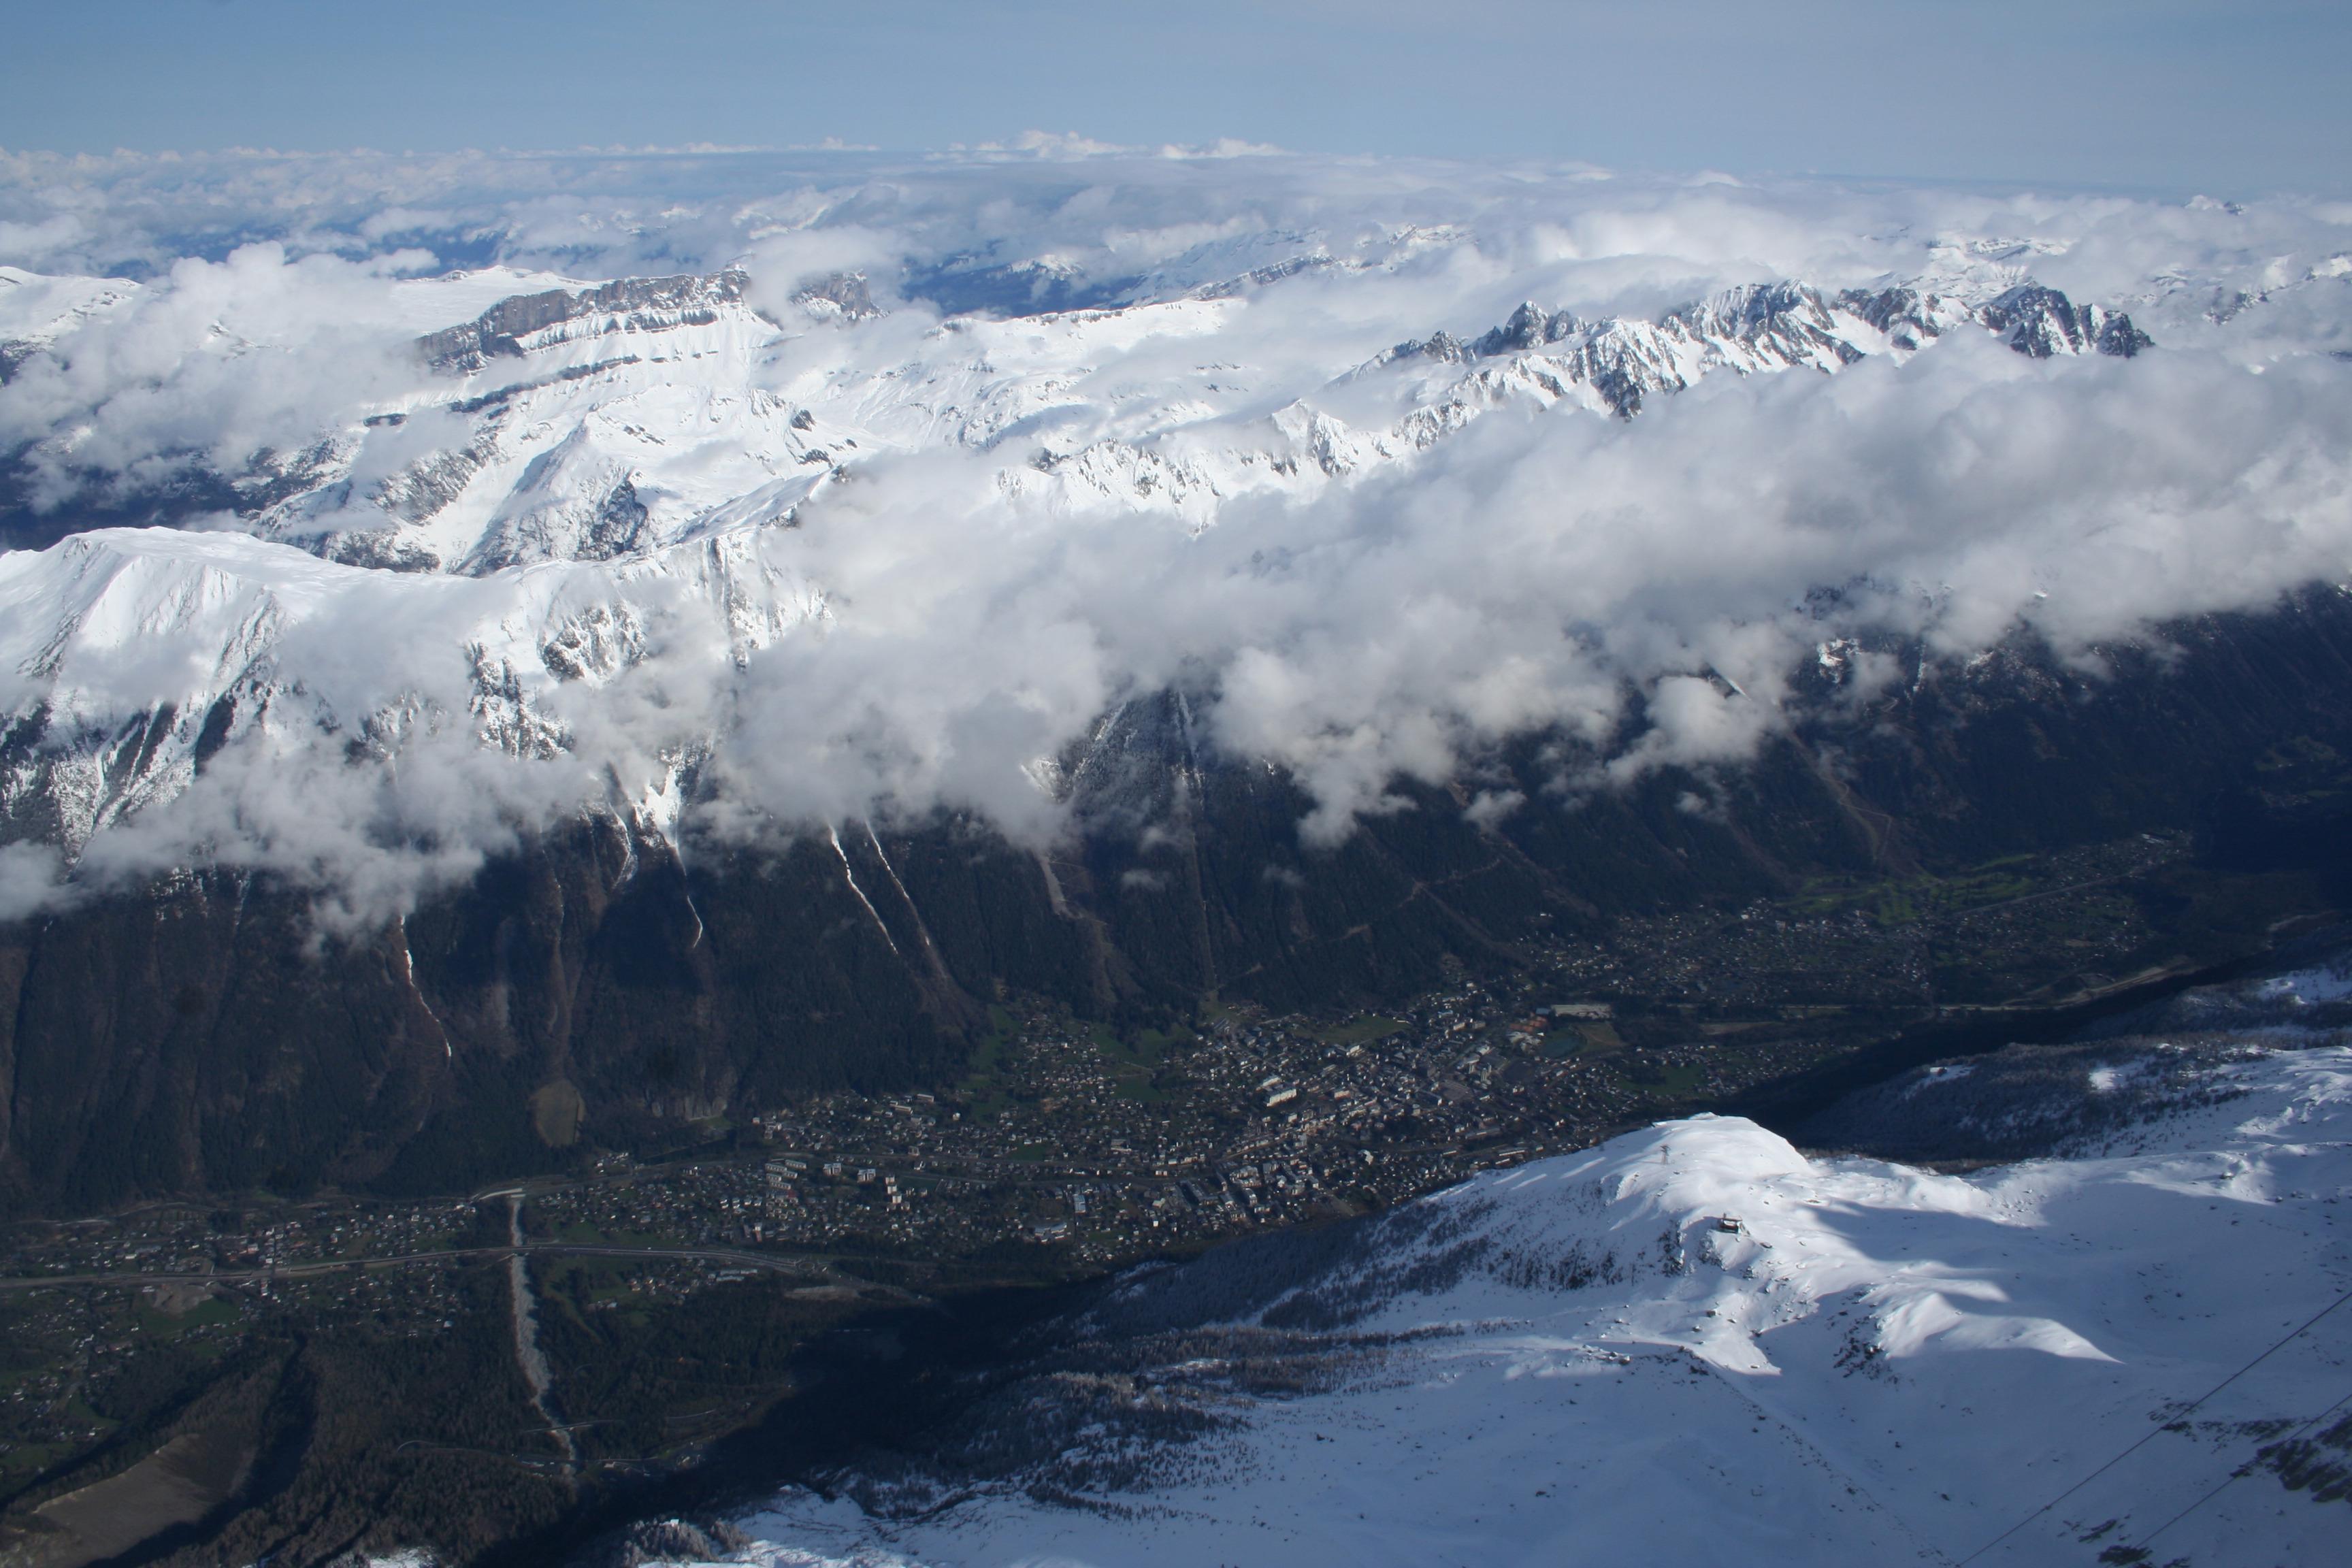 Chamonix, vallée, station de ski